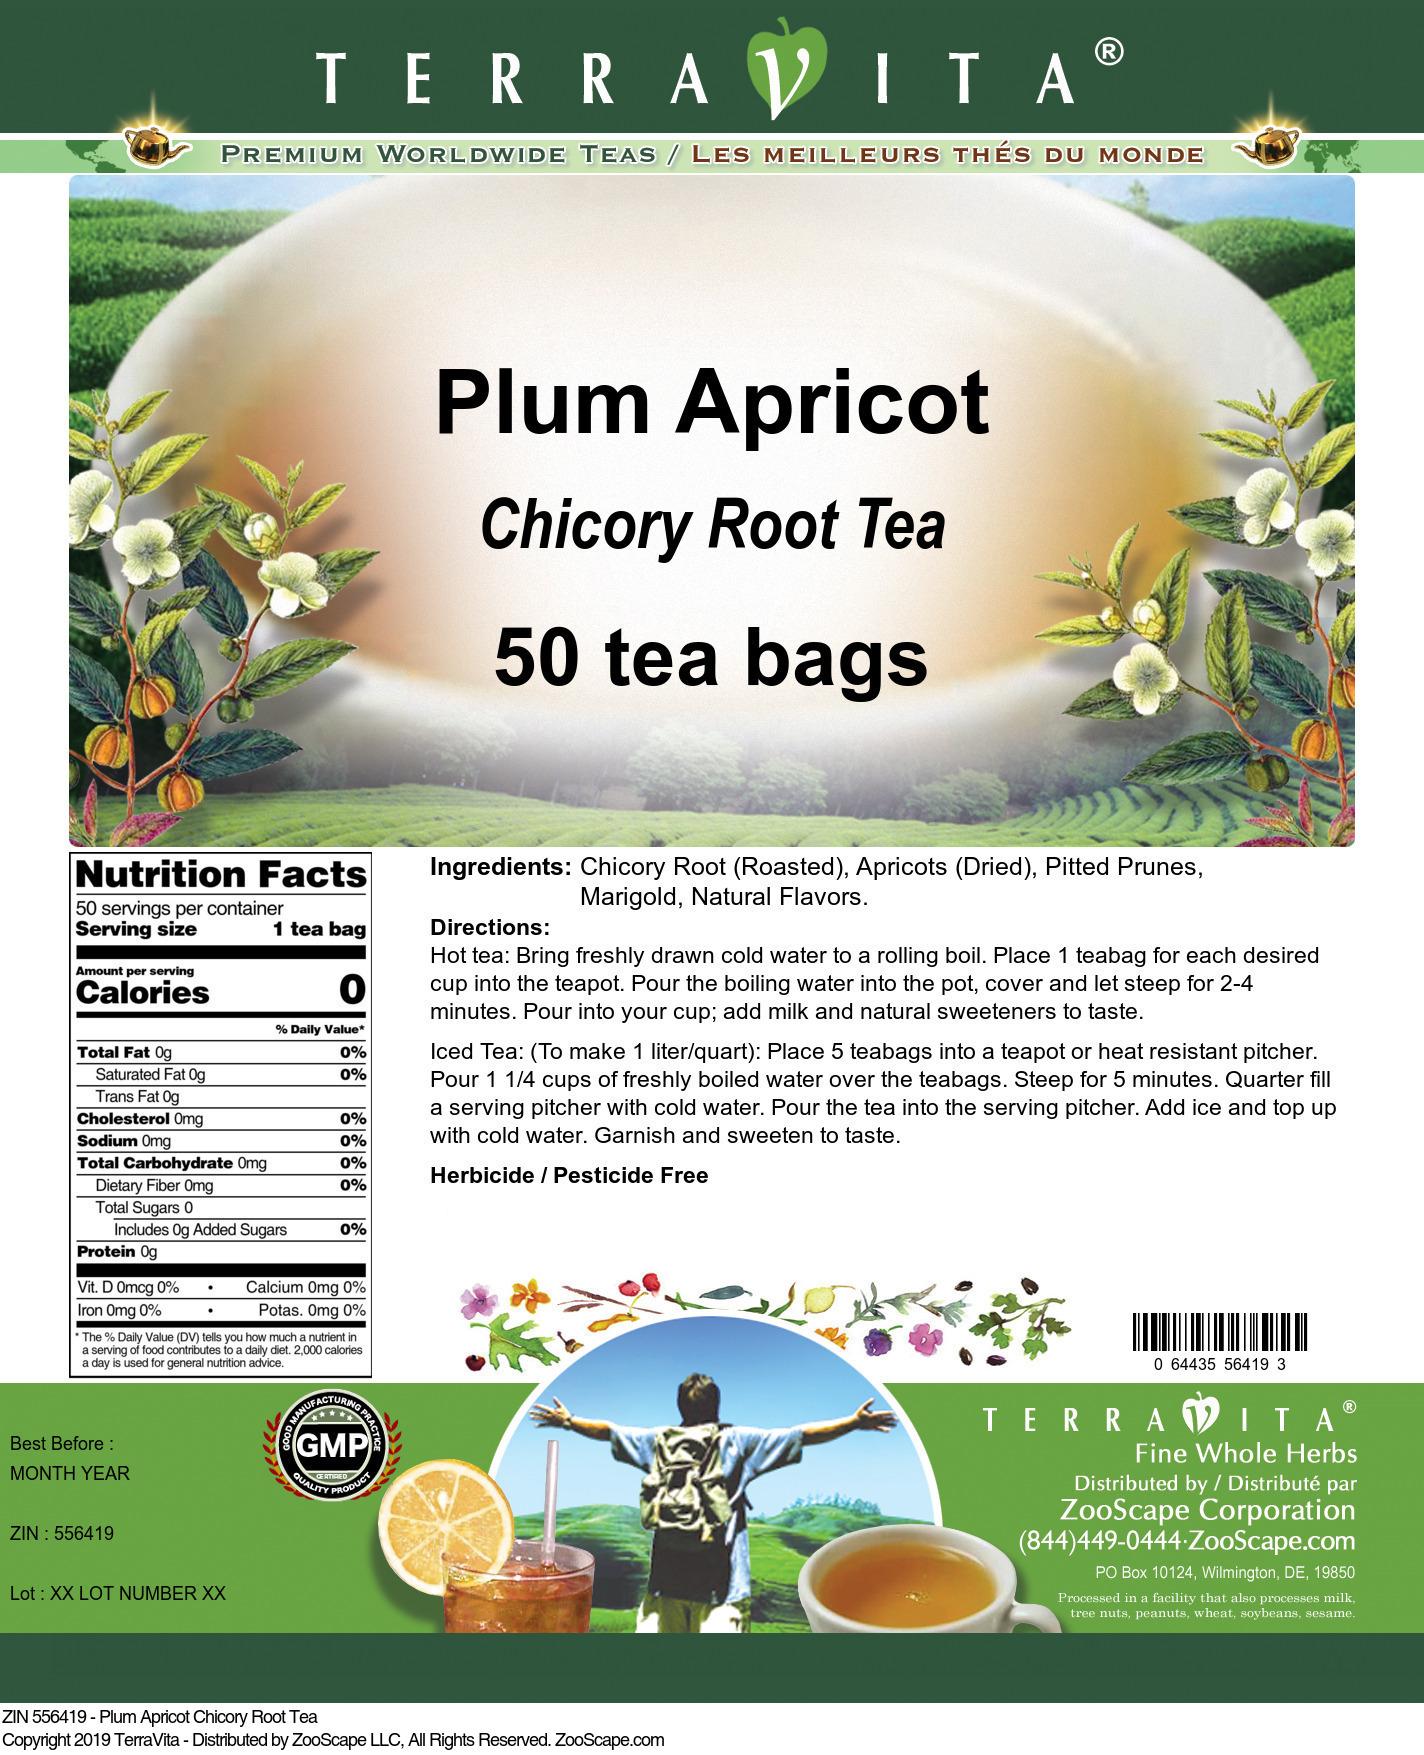 Plum Apricot Chicory Root